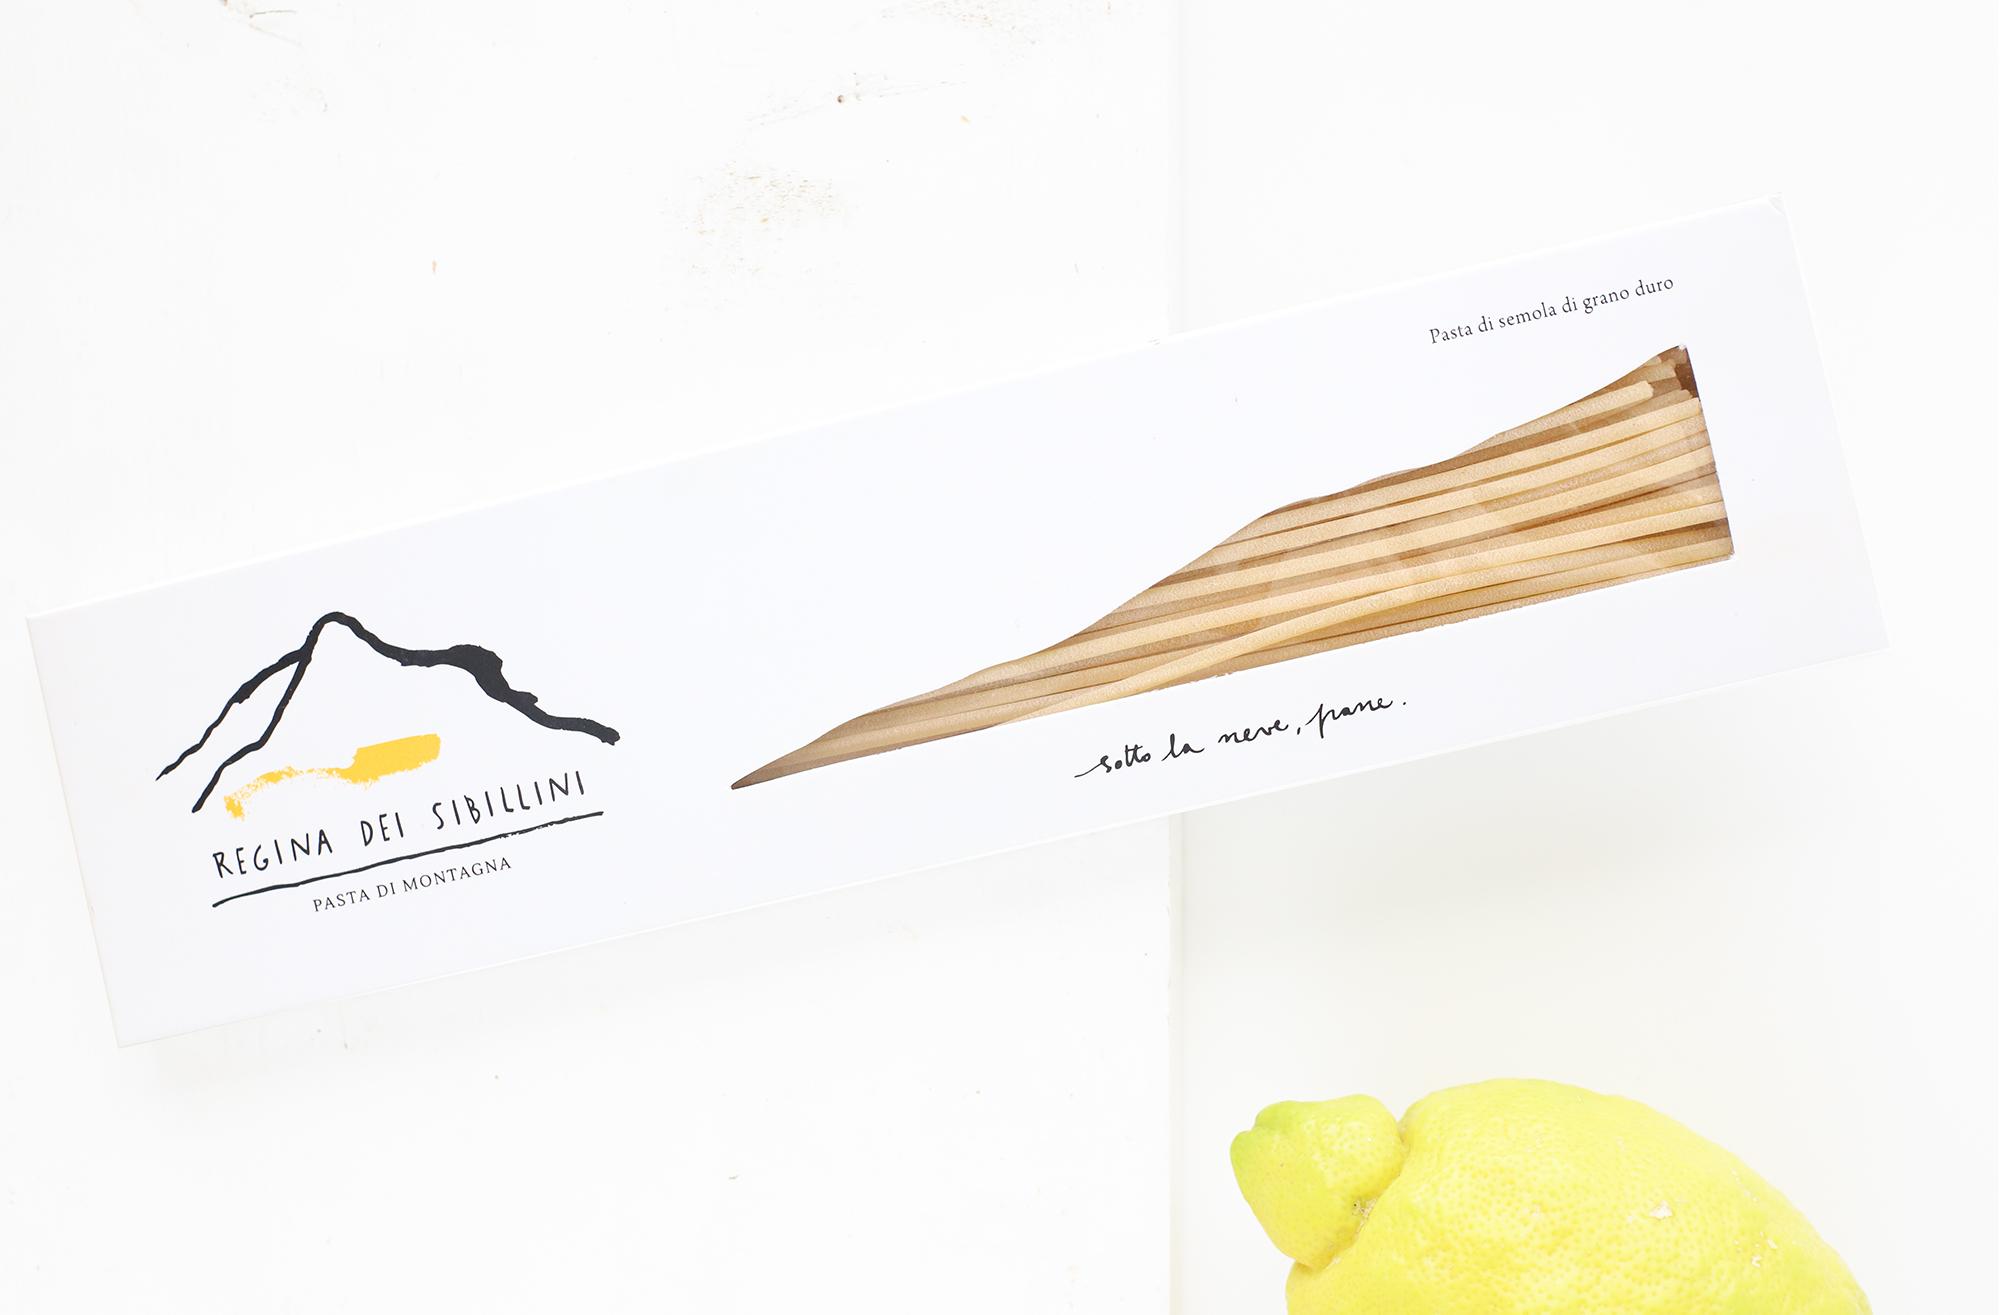 Spaghetti met Parmigiano Reggiano & citroen 'The Lemon Kitchen